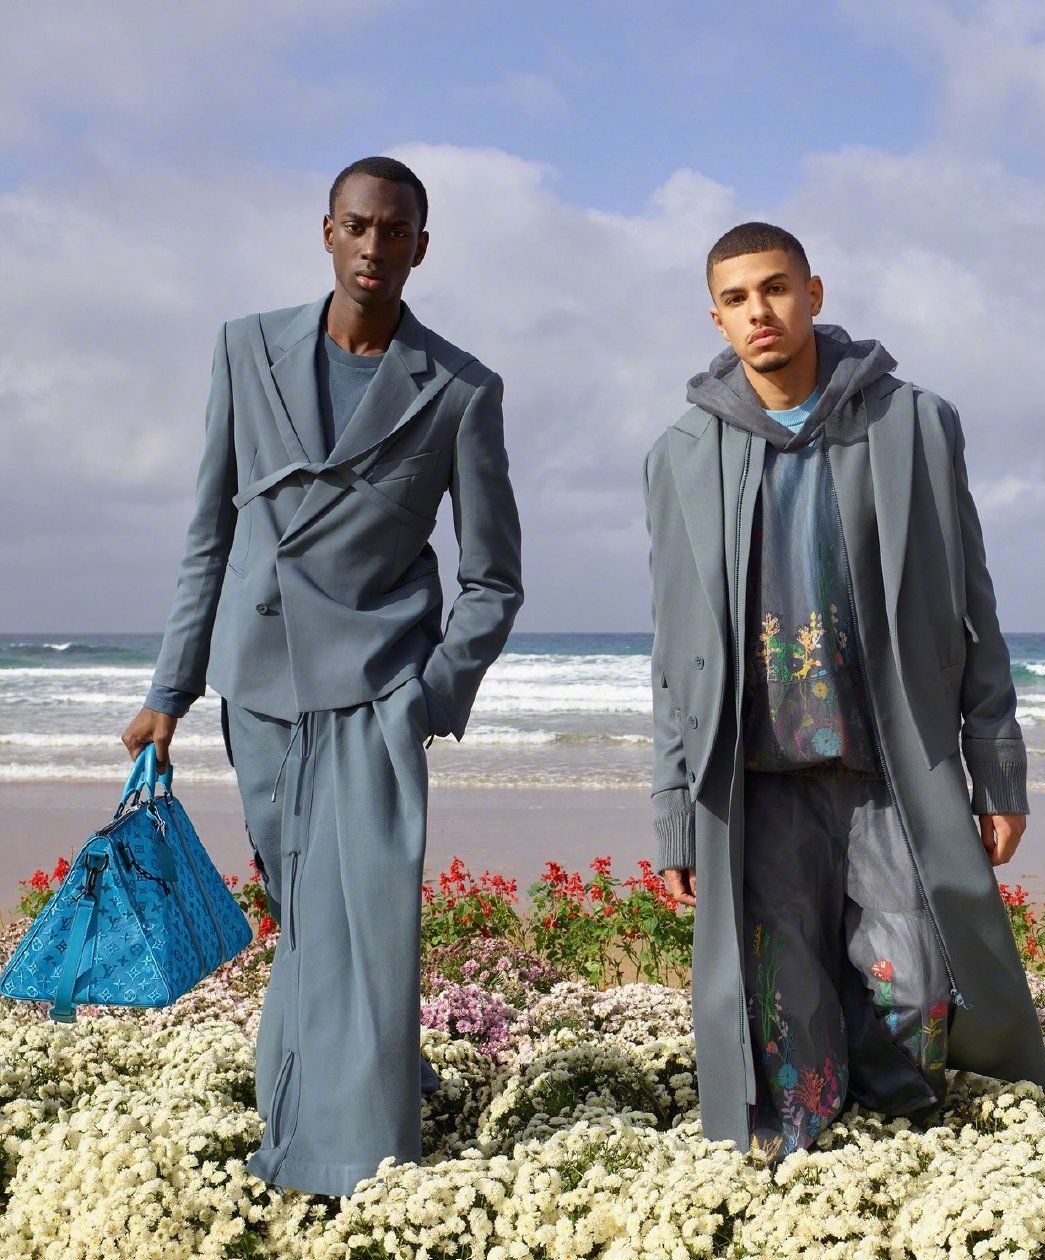 Louis Vuitton Spring/Summer 2020 Menswear